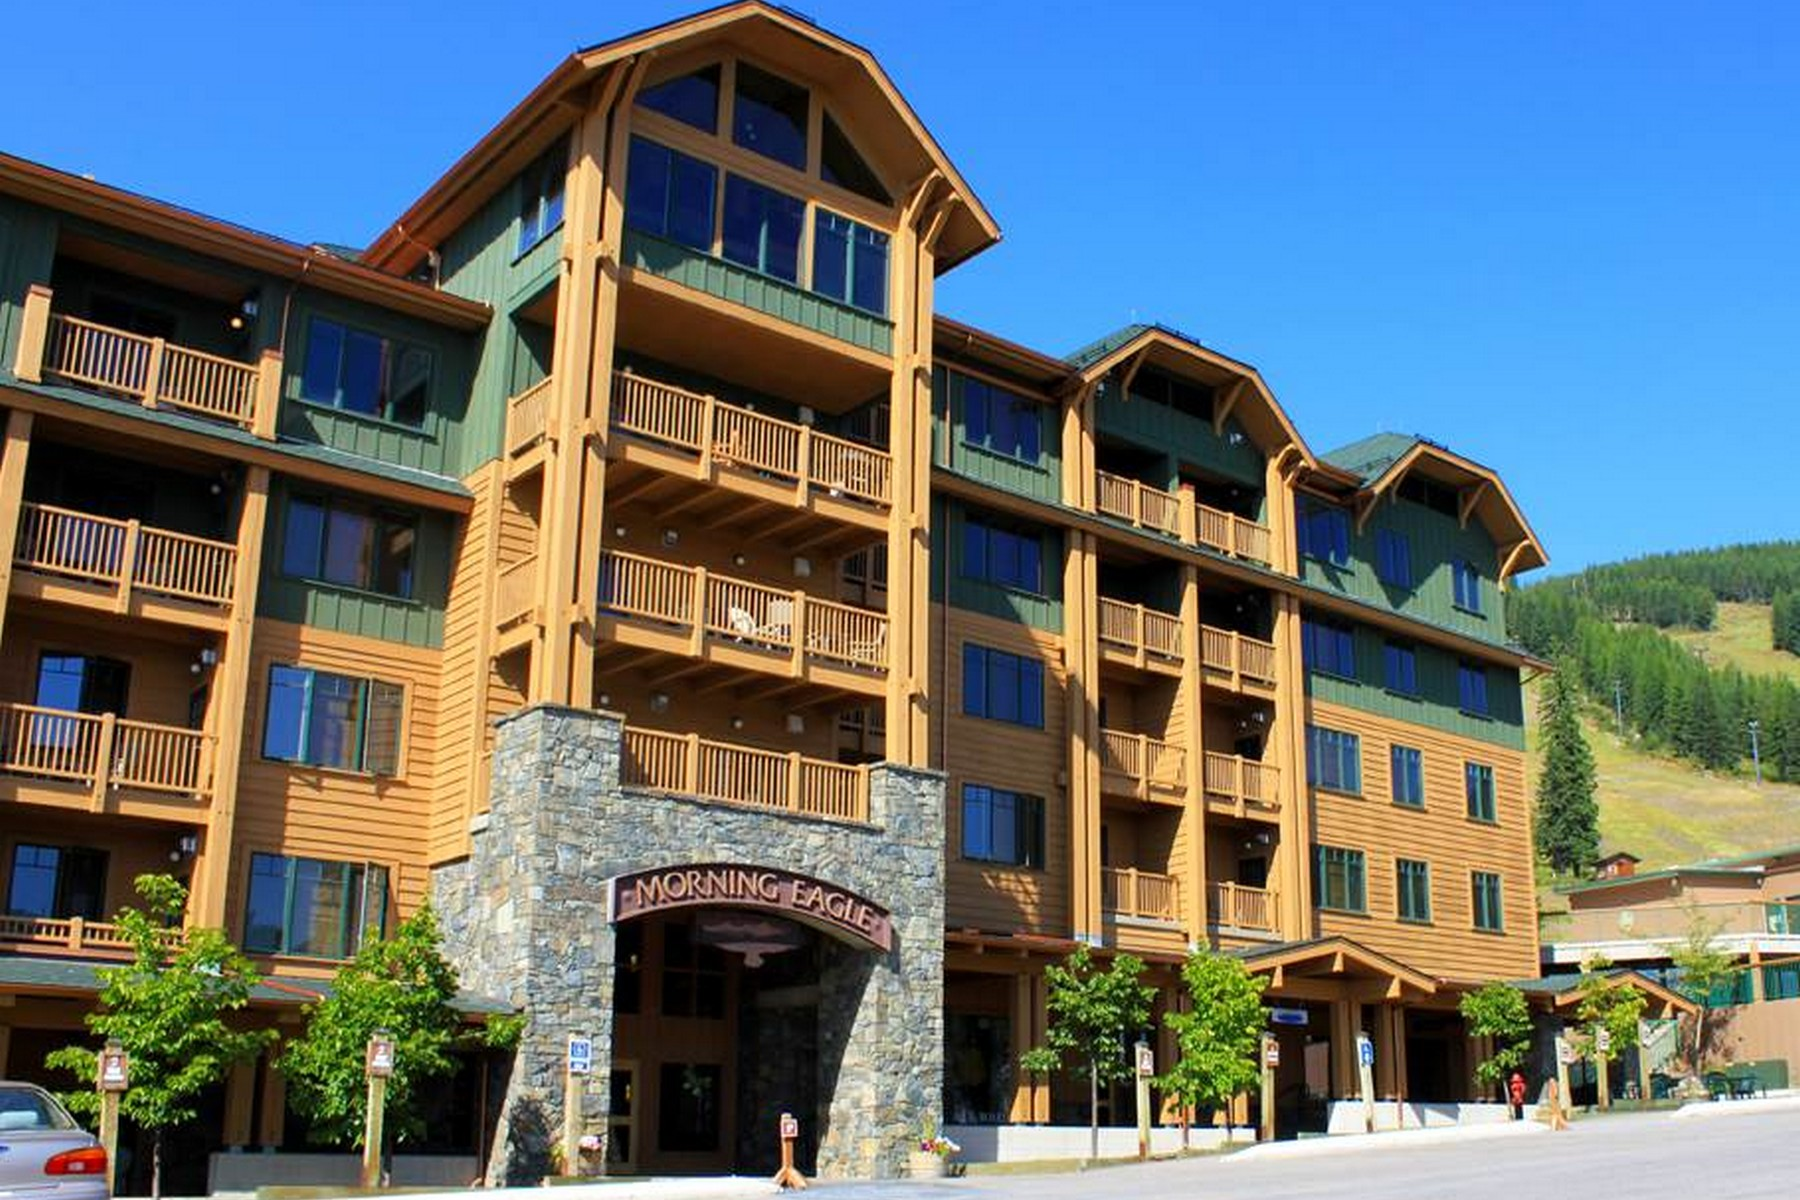 sales property at 3893 Big Mountain Road, Morning Eagle 505